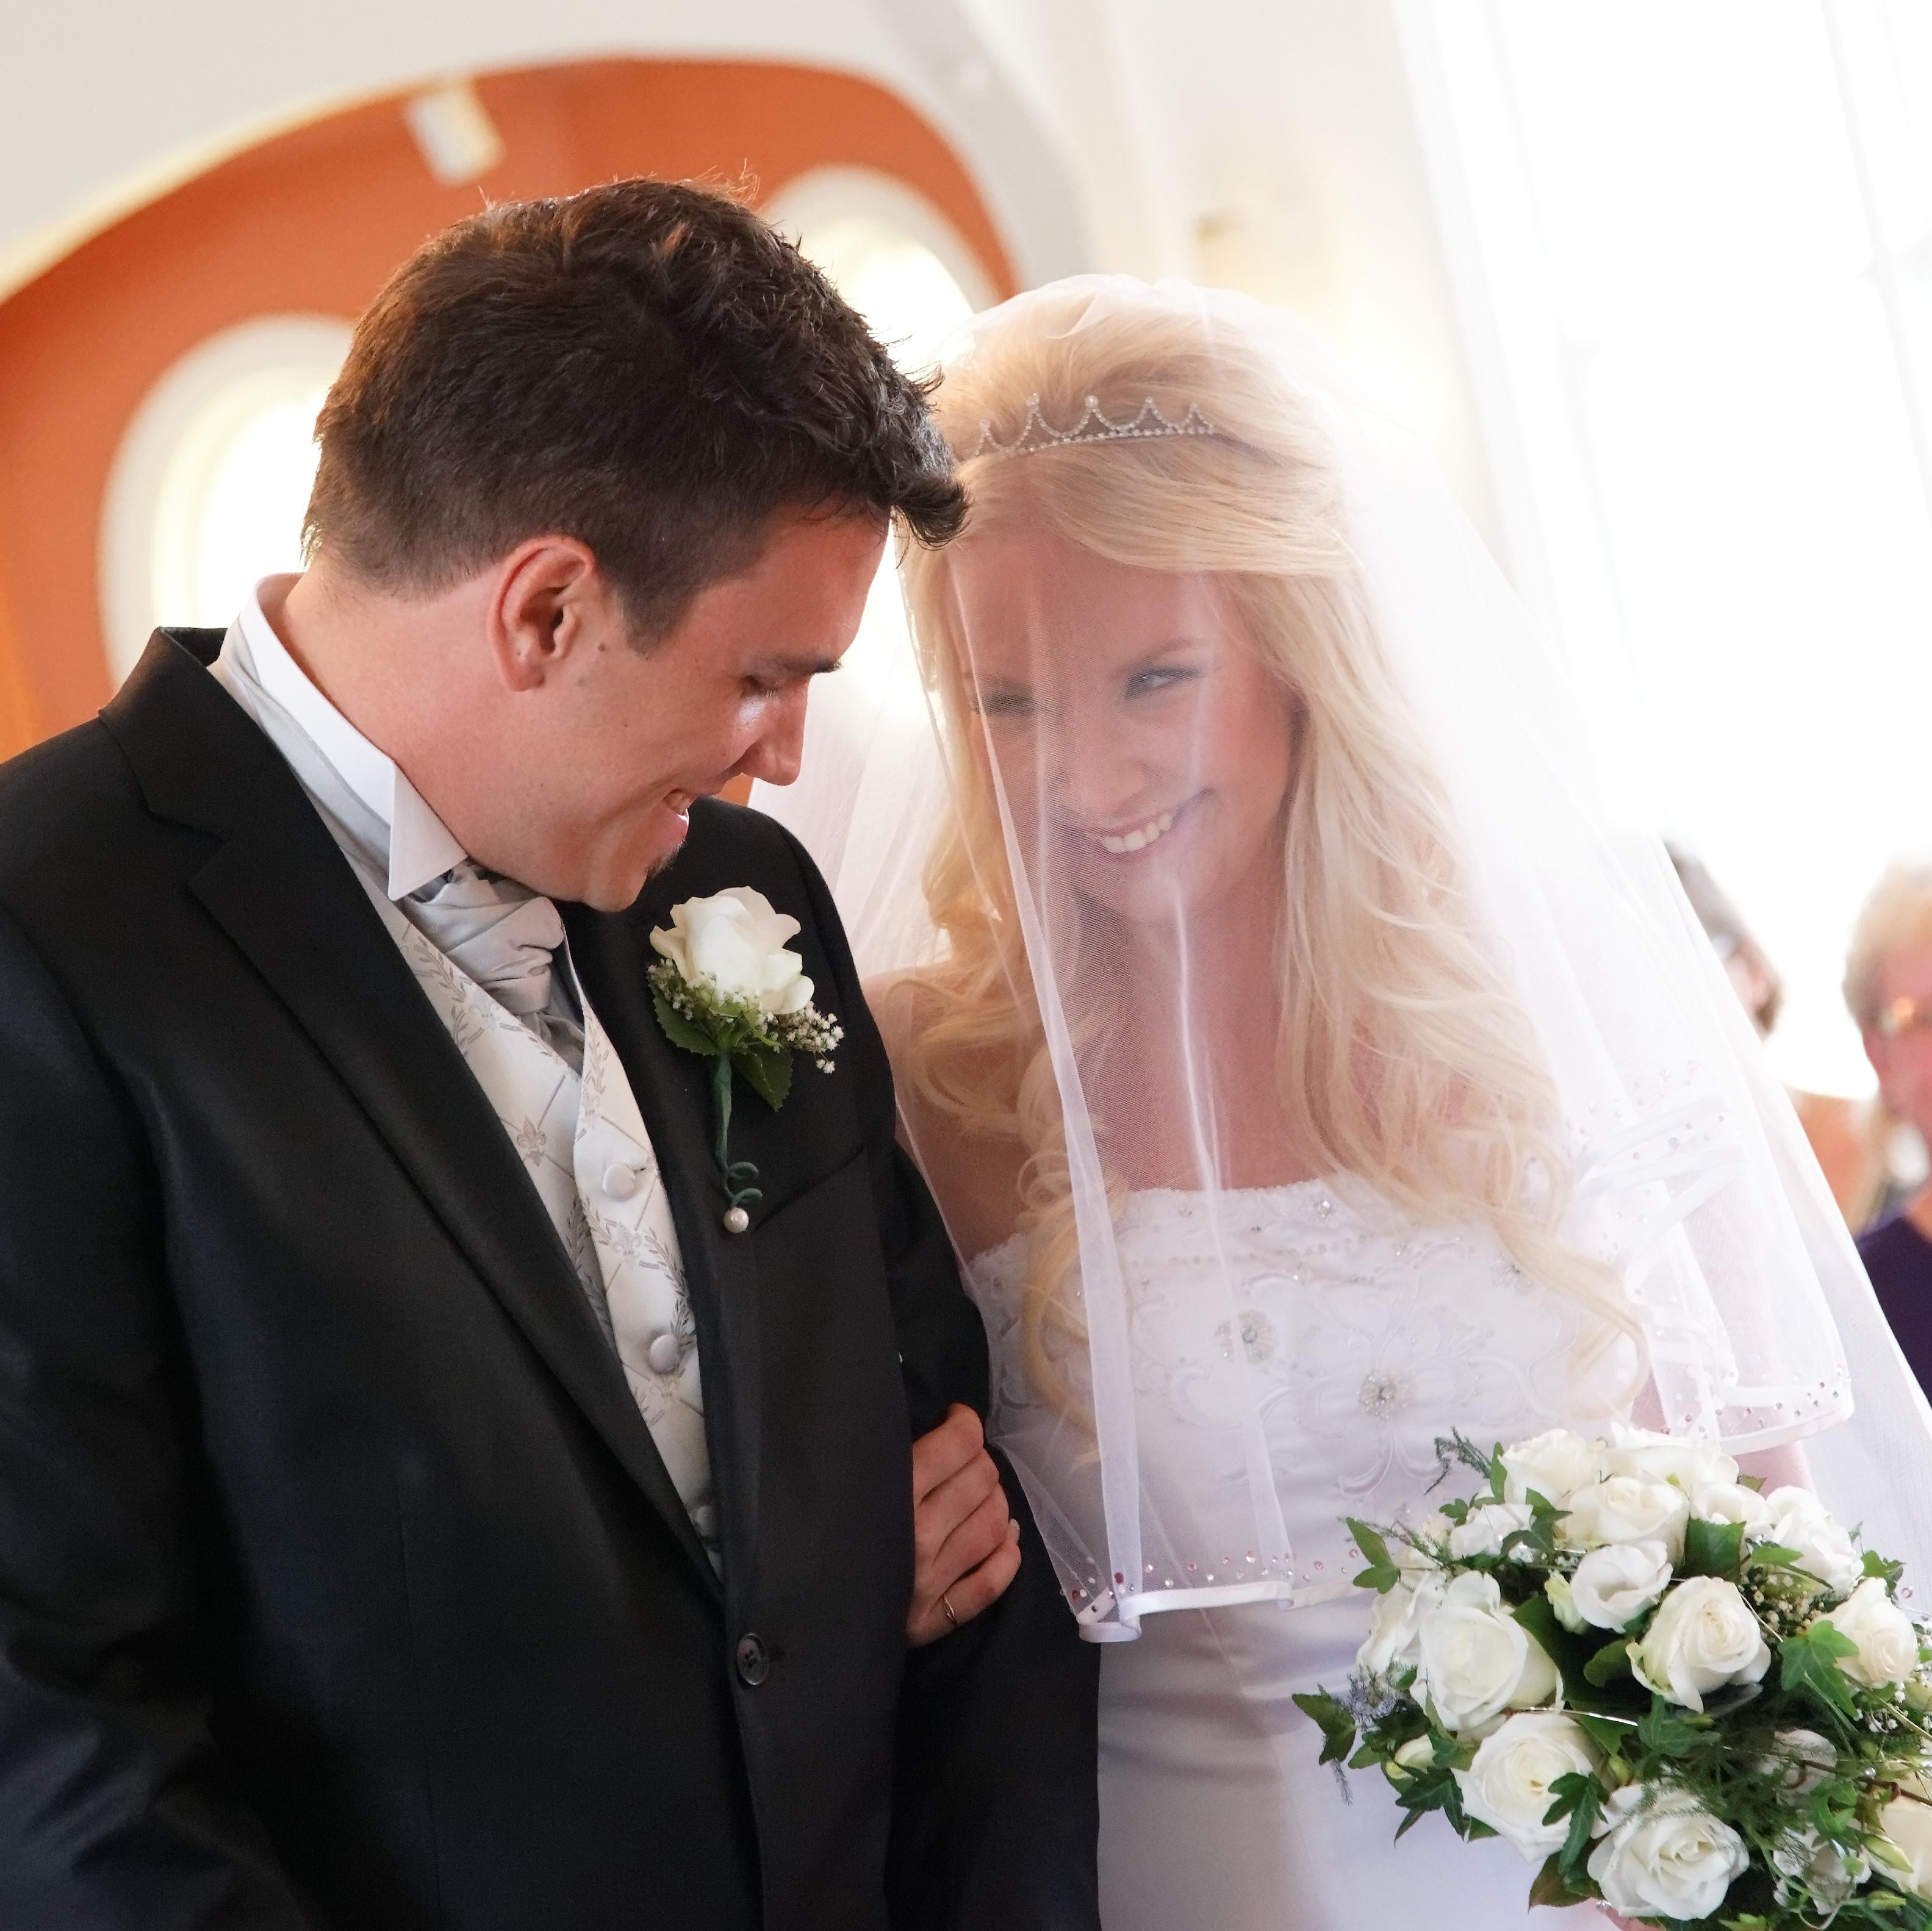 Bröllopsceremoni - Älvsjö kyrka